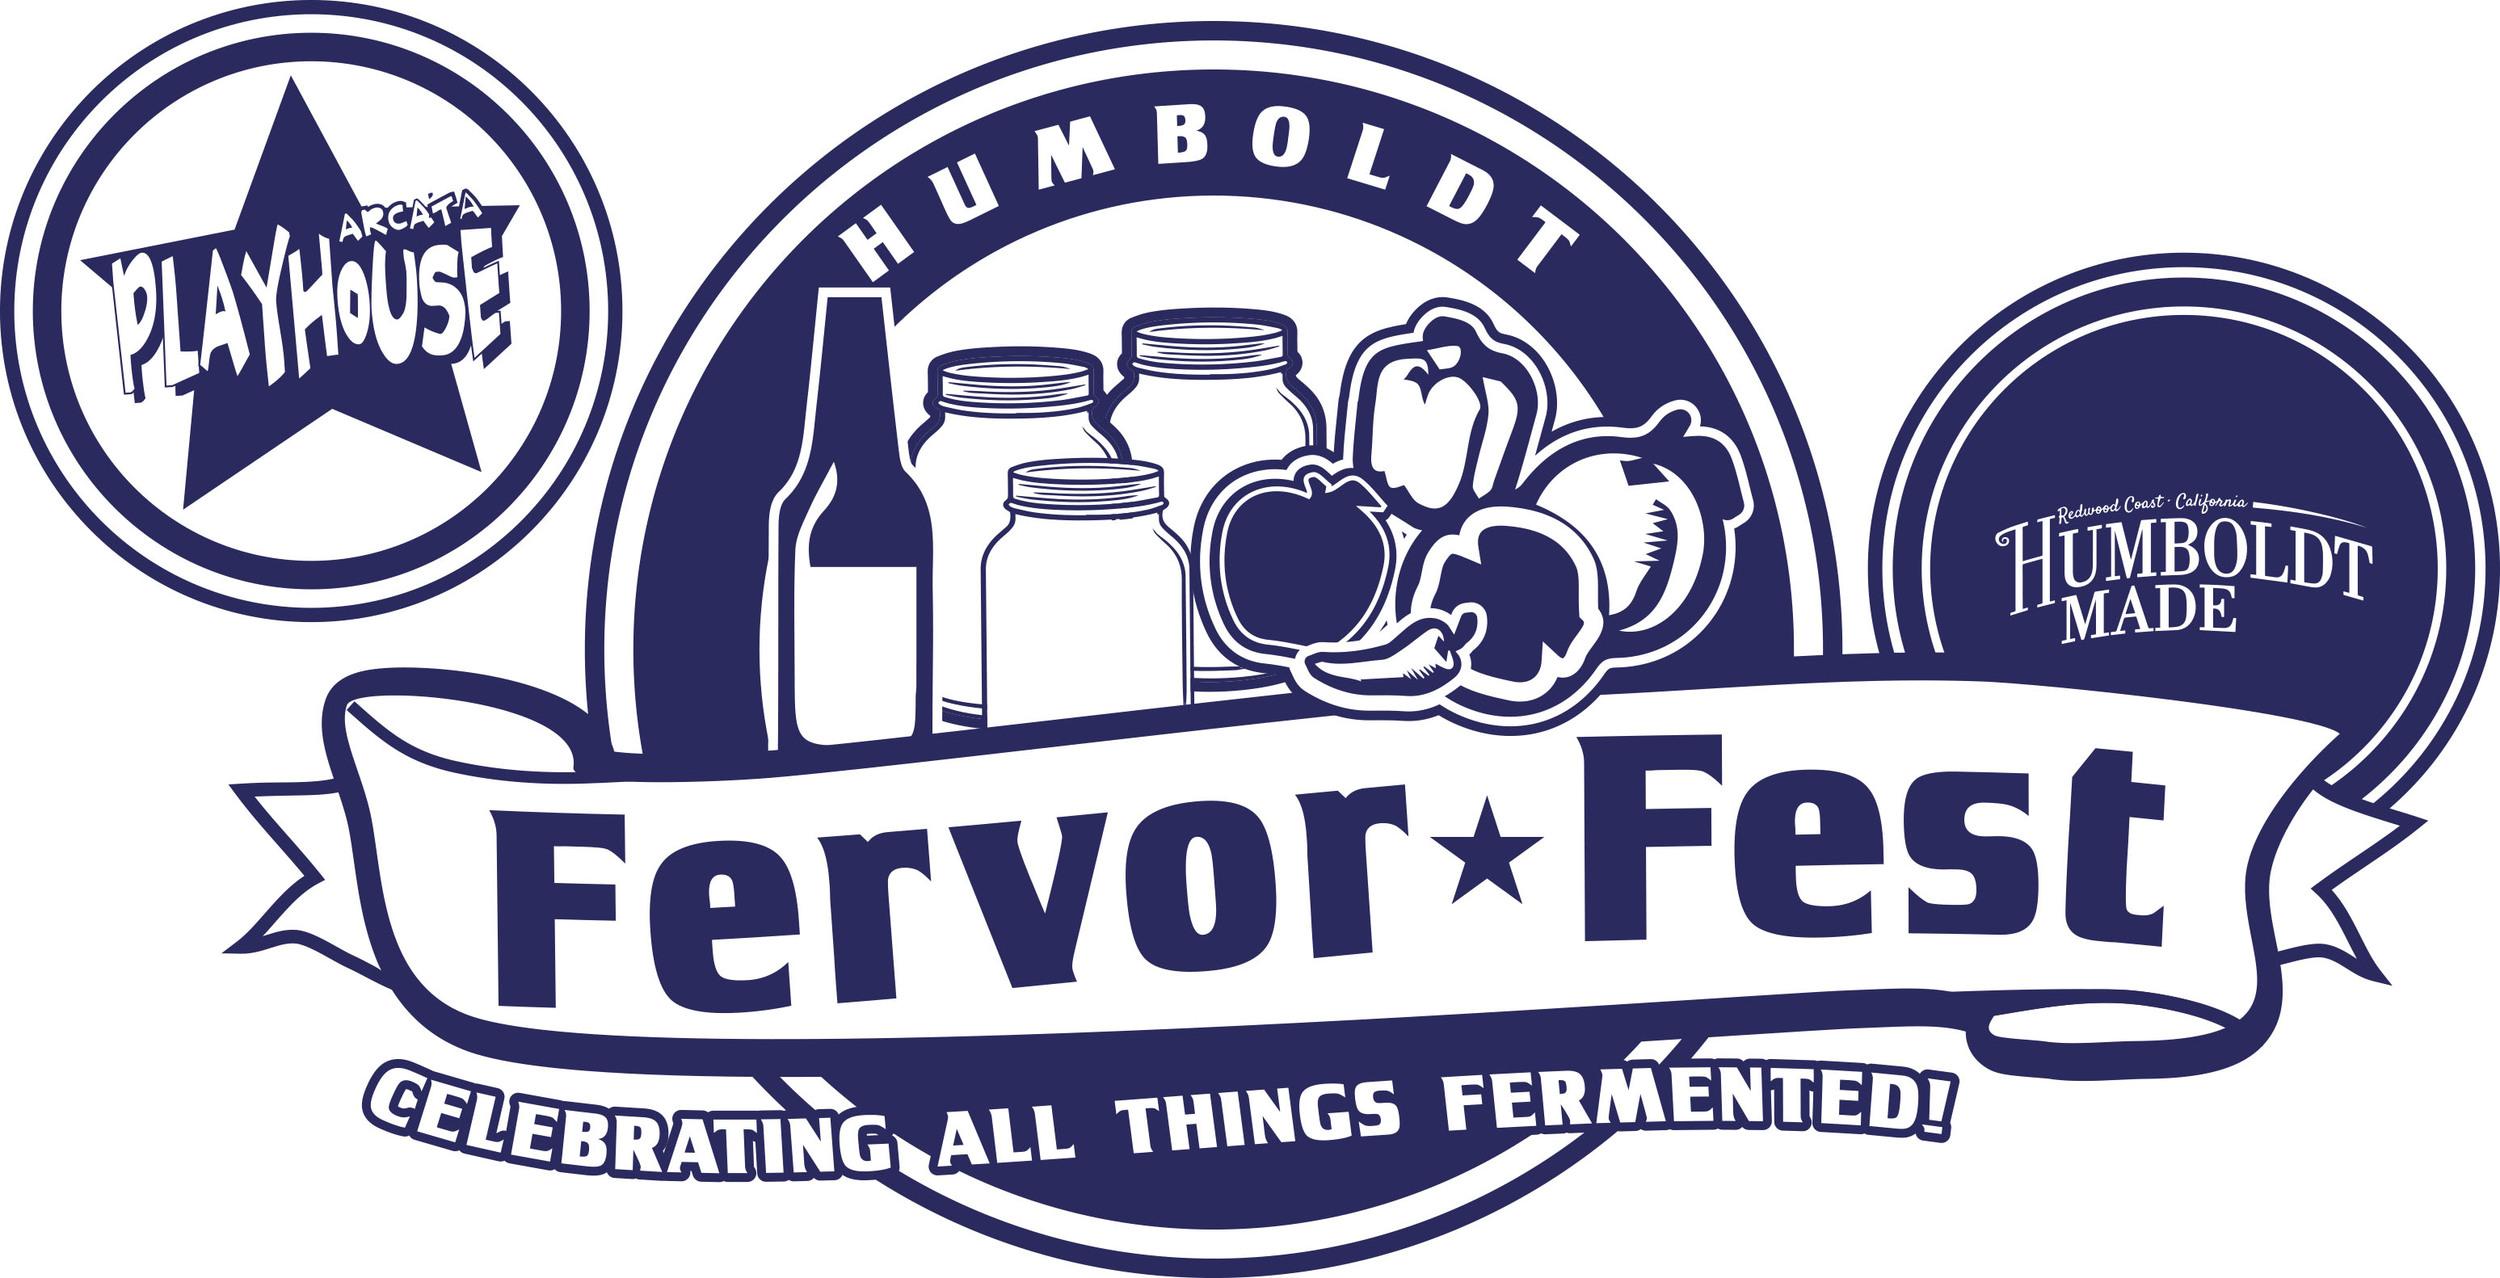 Fervor Fest